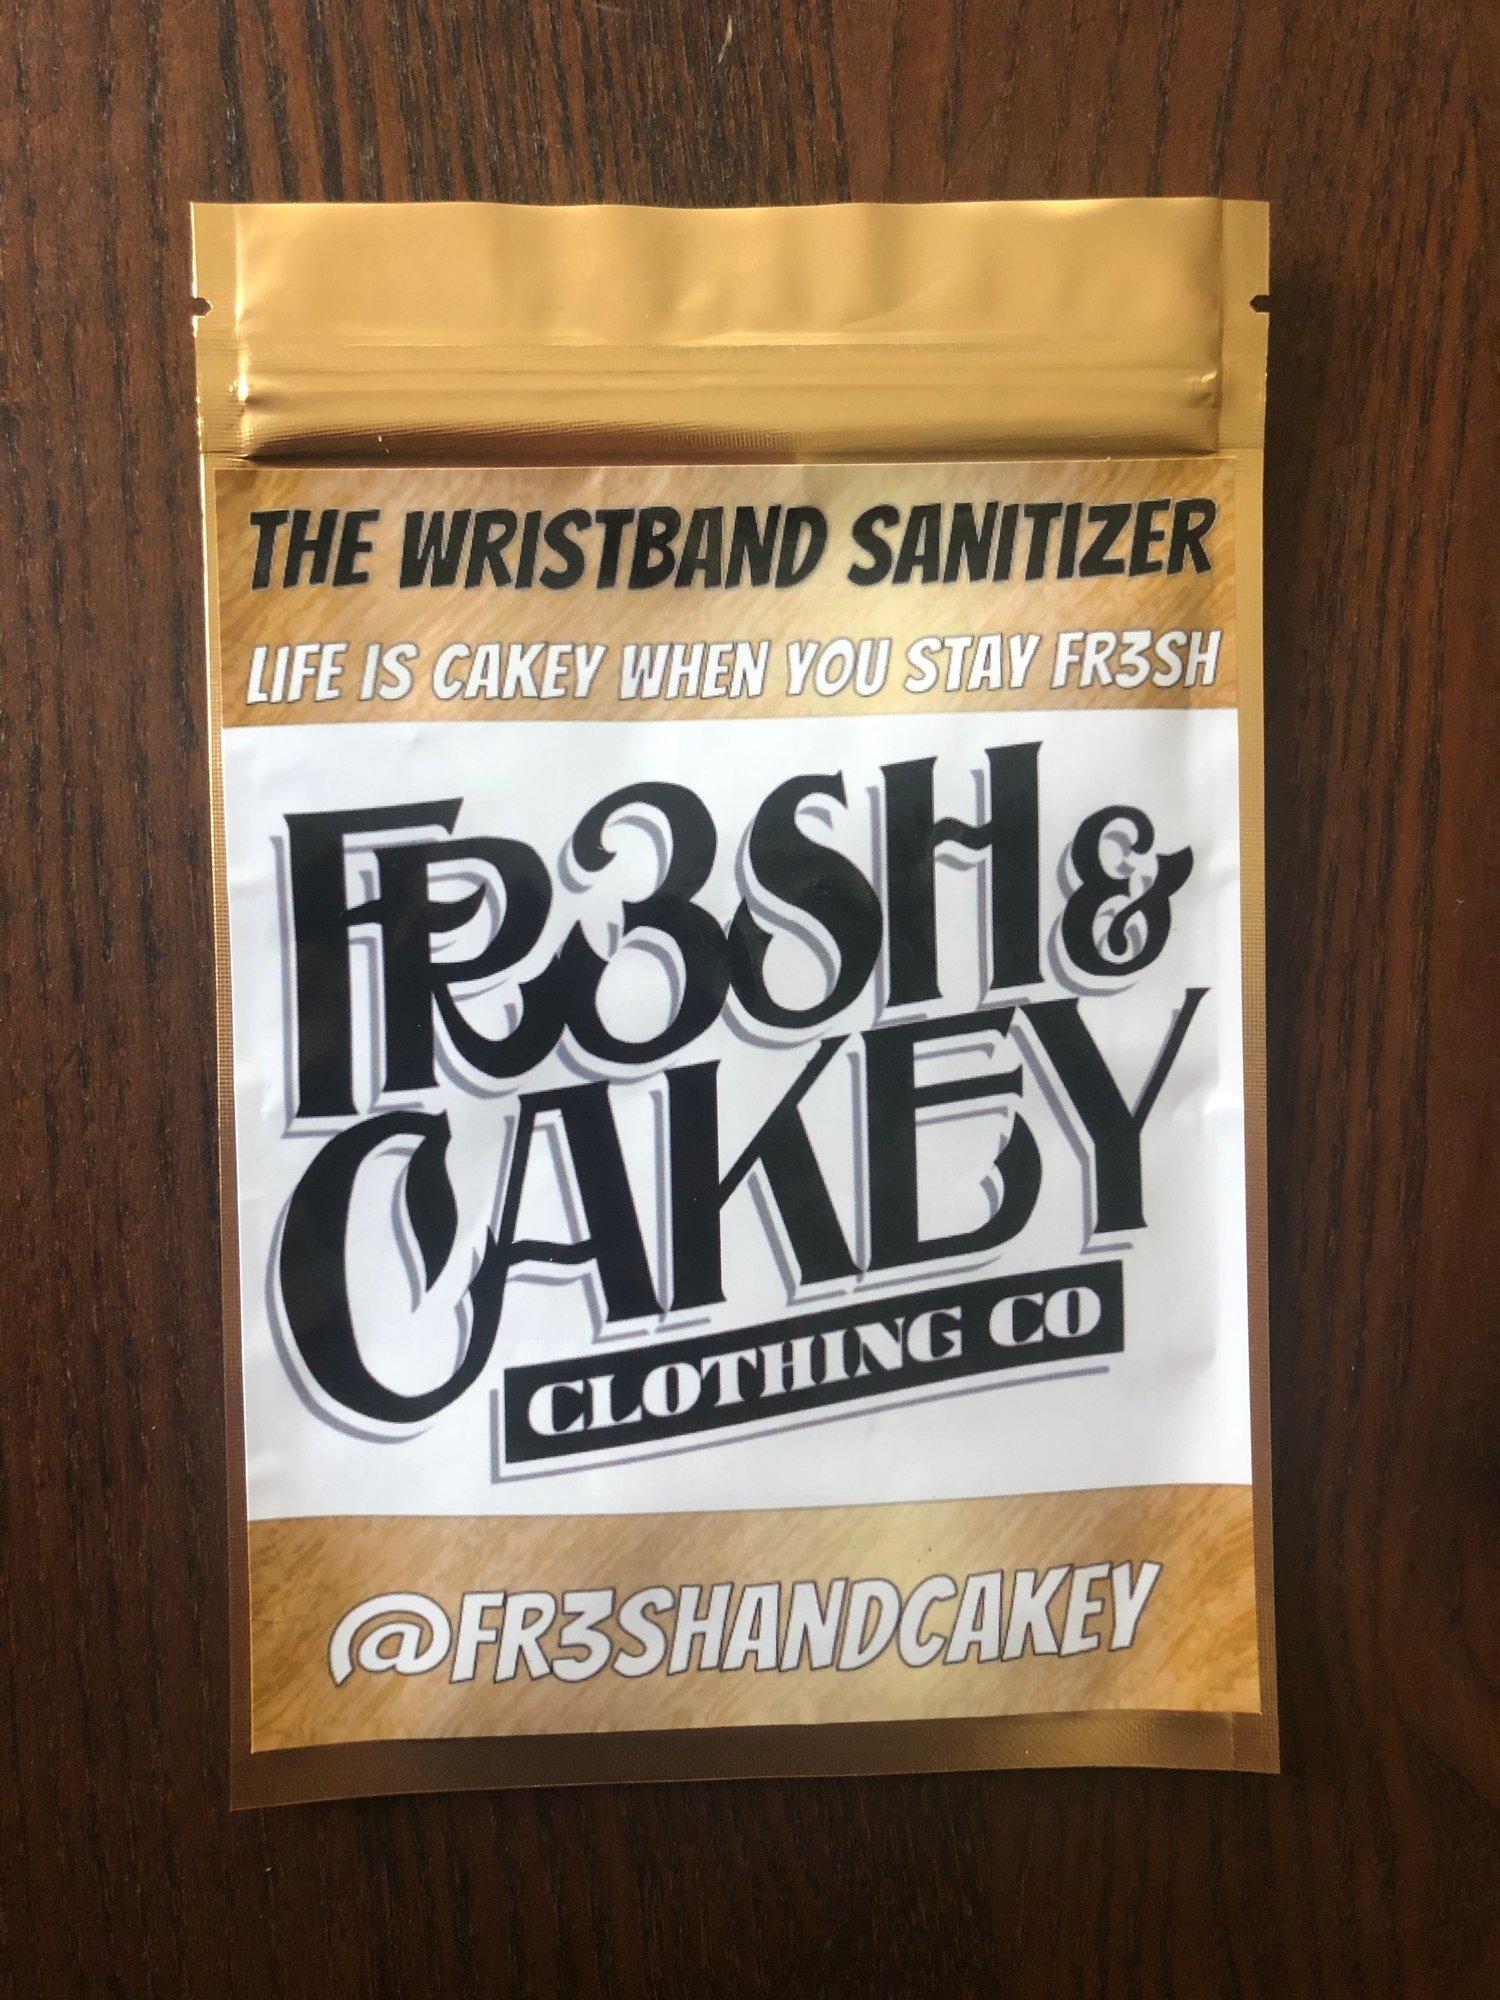 Image of The Wristband Sanitizer